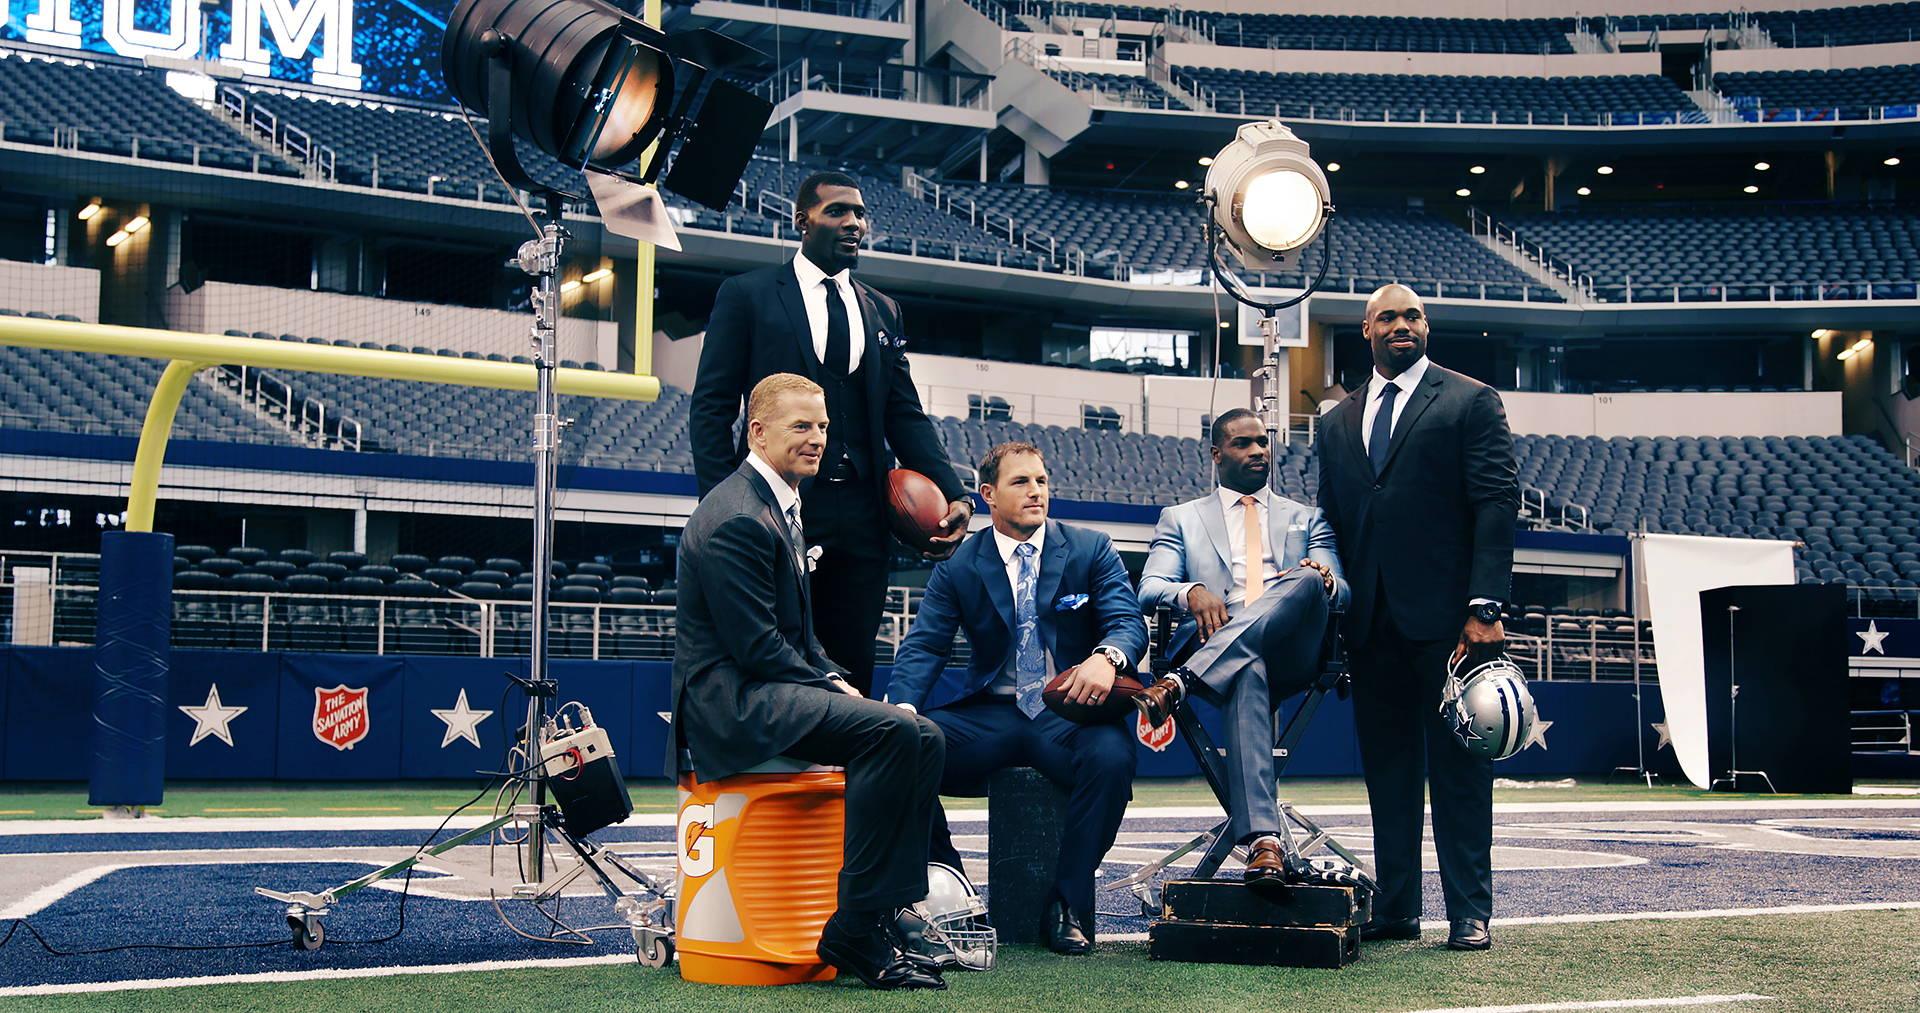 Dallas Cowboys Hublot Watches - Media Production | Kinter Media